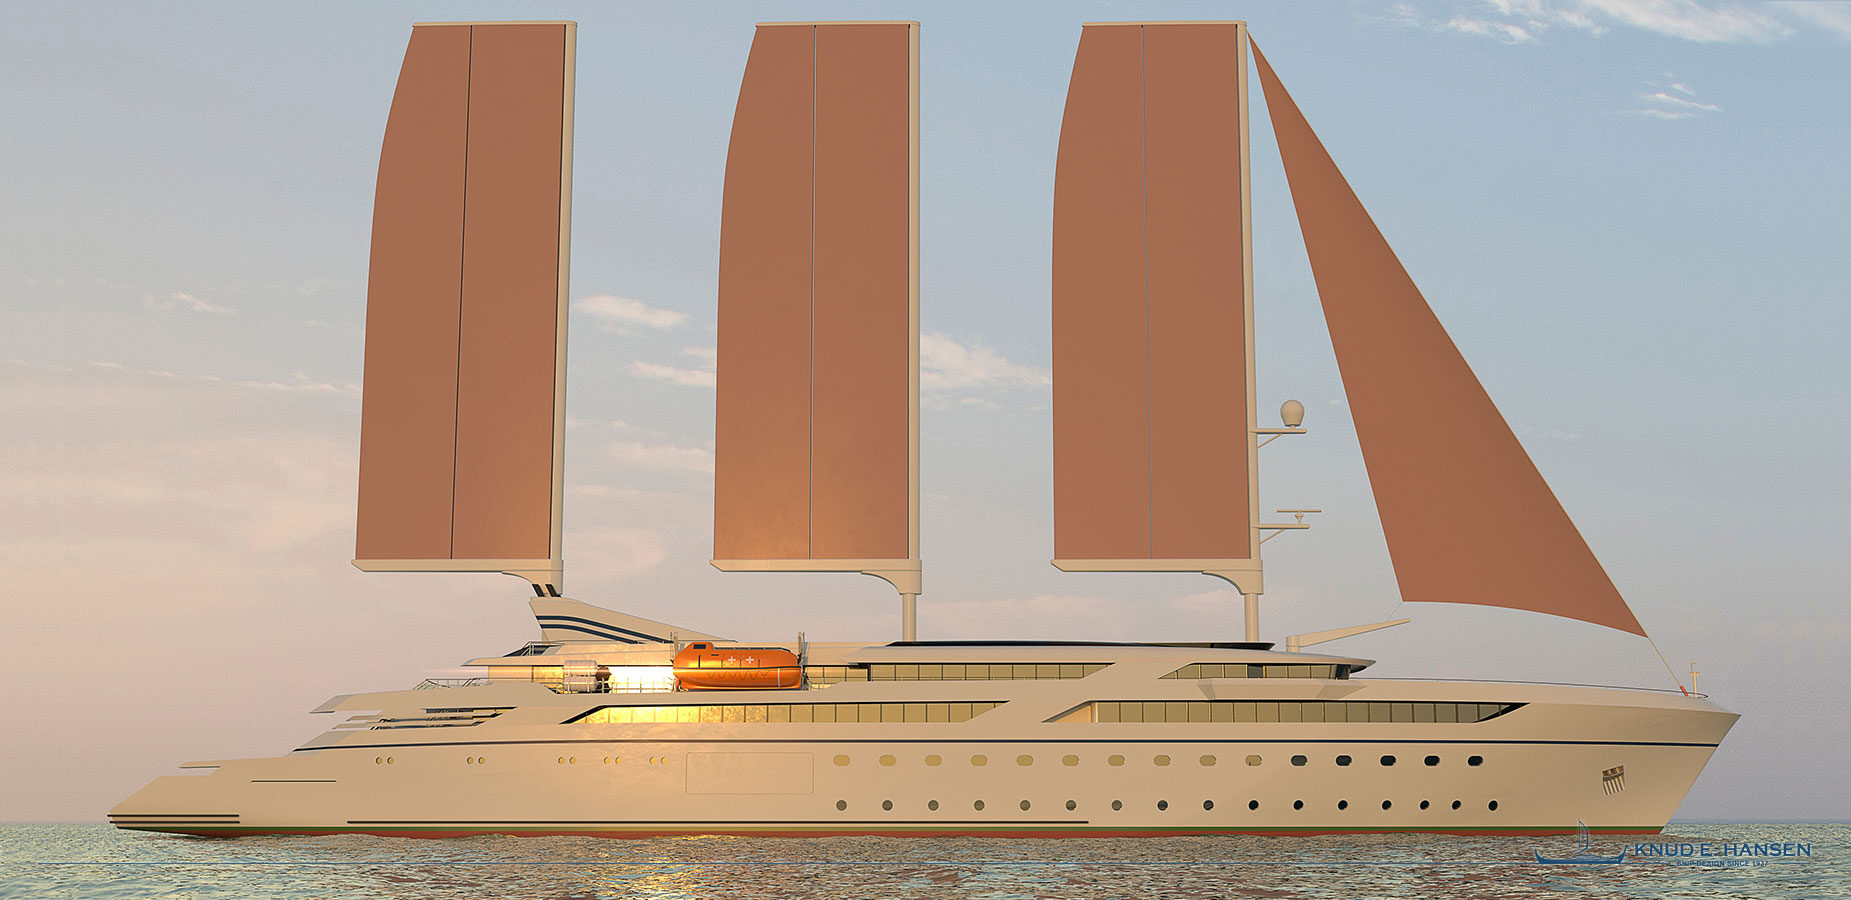 110 m adventure wind cruise vessel knud e hansen. Black Bedroom Furniture Sets. Home Design Ideas